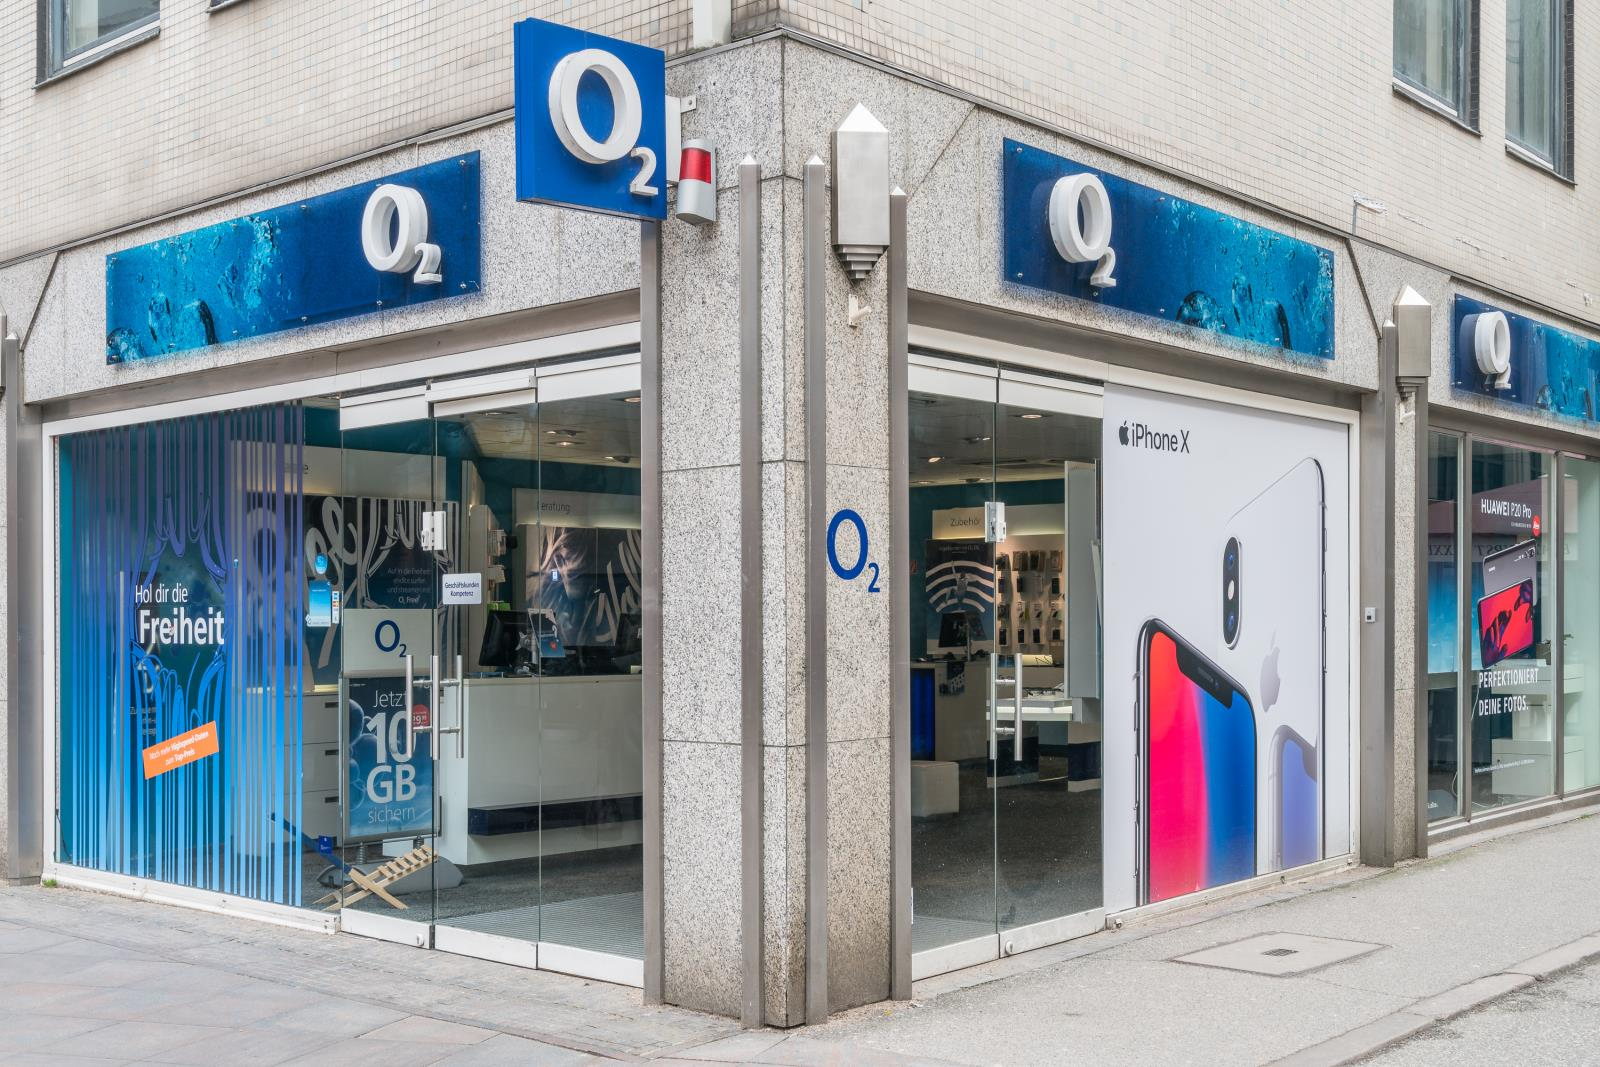 o2 Shop, Breite Str. 55 in Lübeck